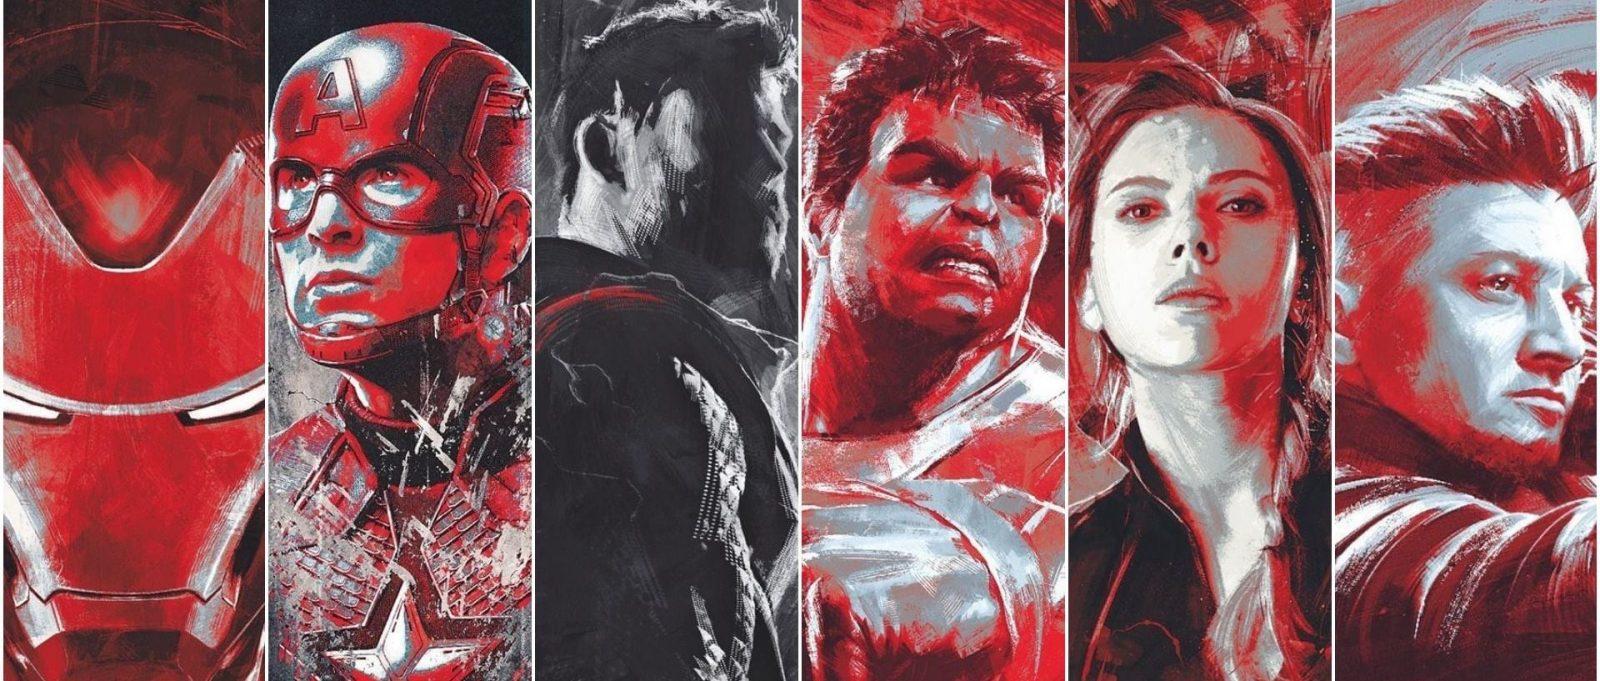 «Мстители: Финал» ставит рекорды проката